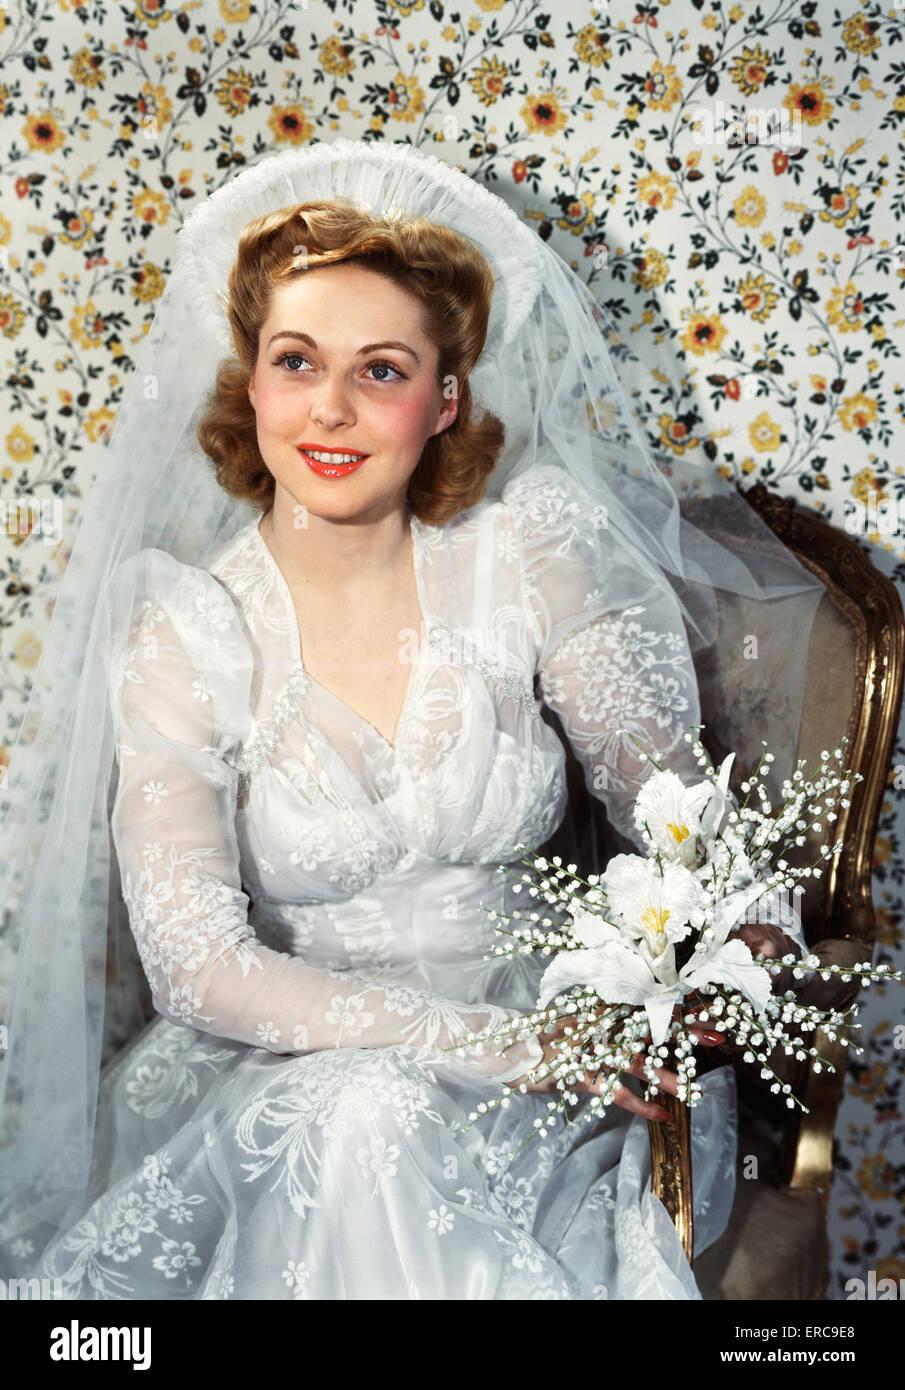 Vintage Wedding Stockfotos & Vintage Wedding Bilder - Alamy